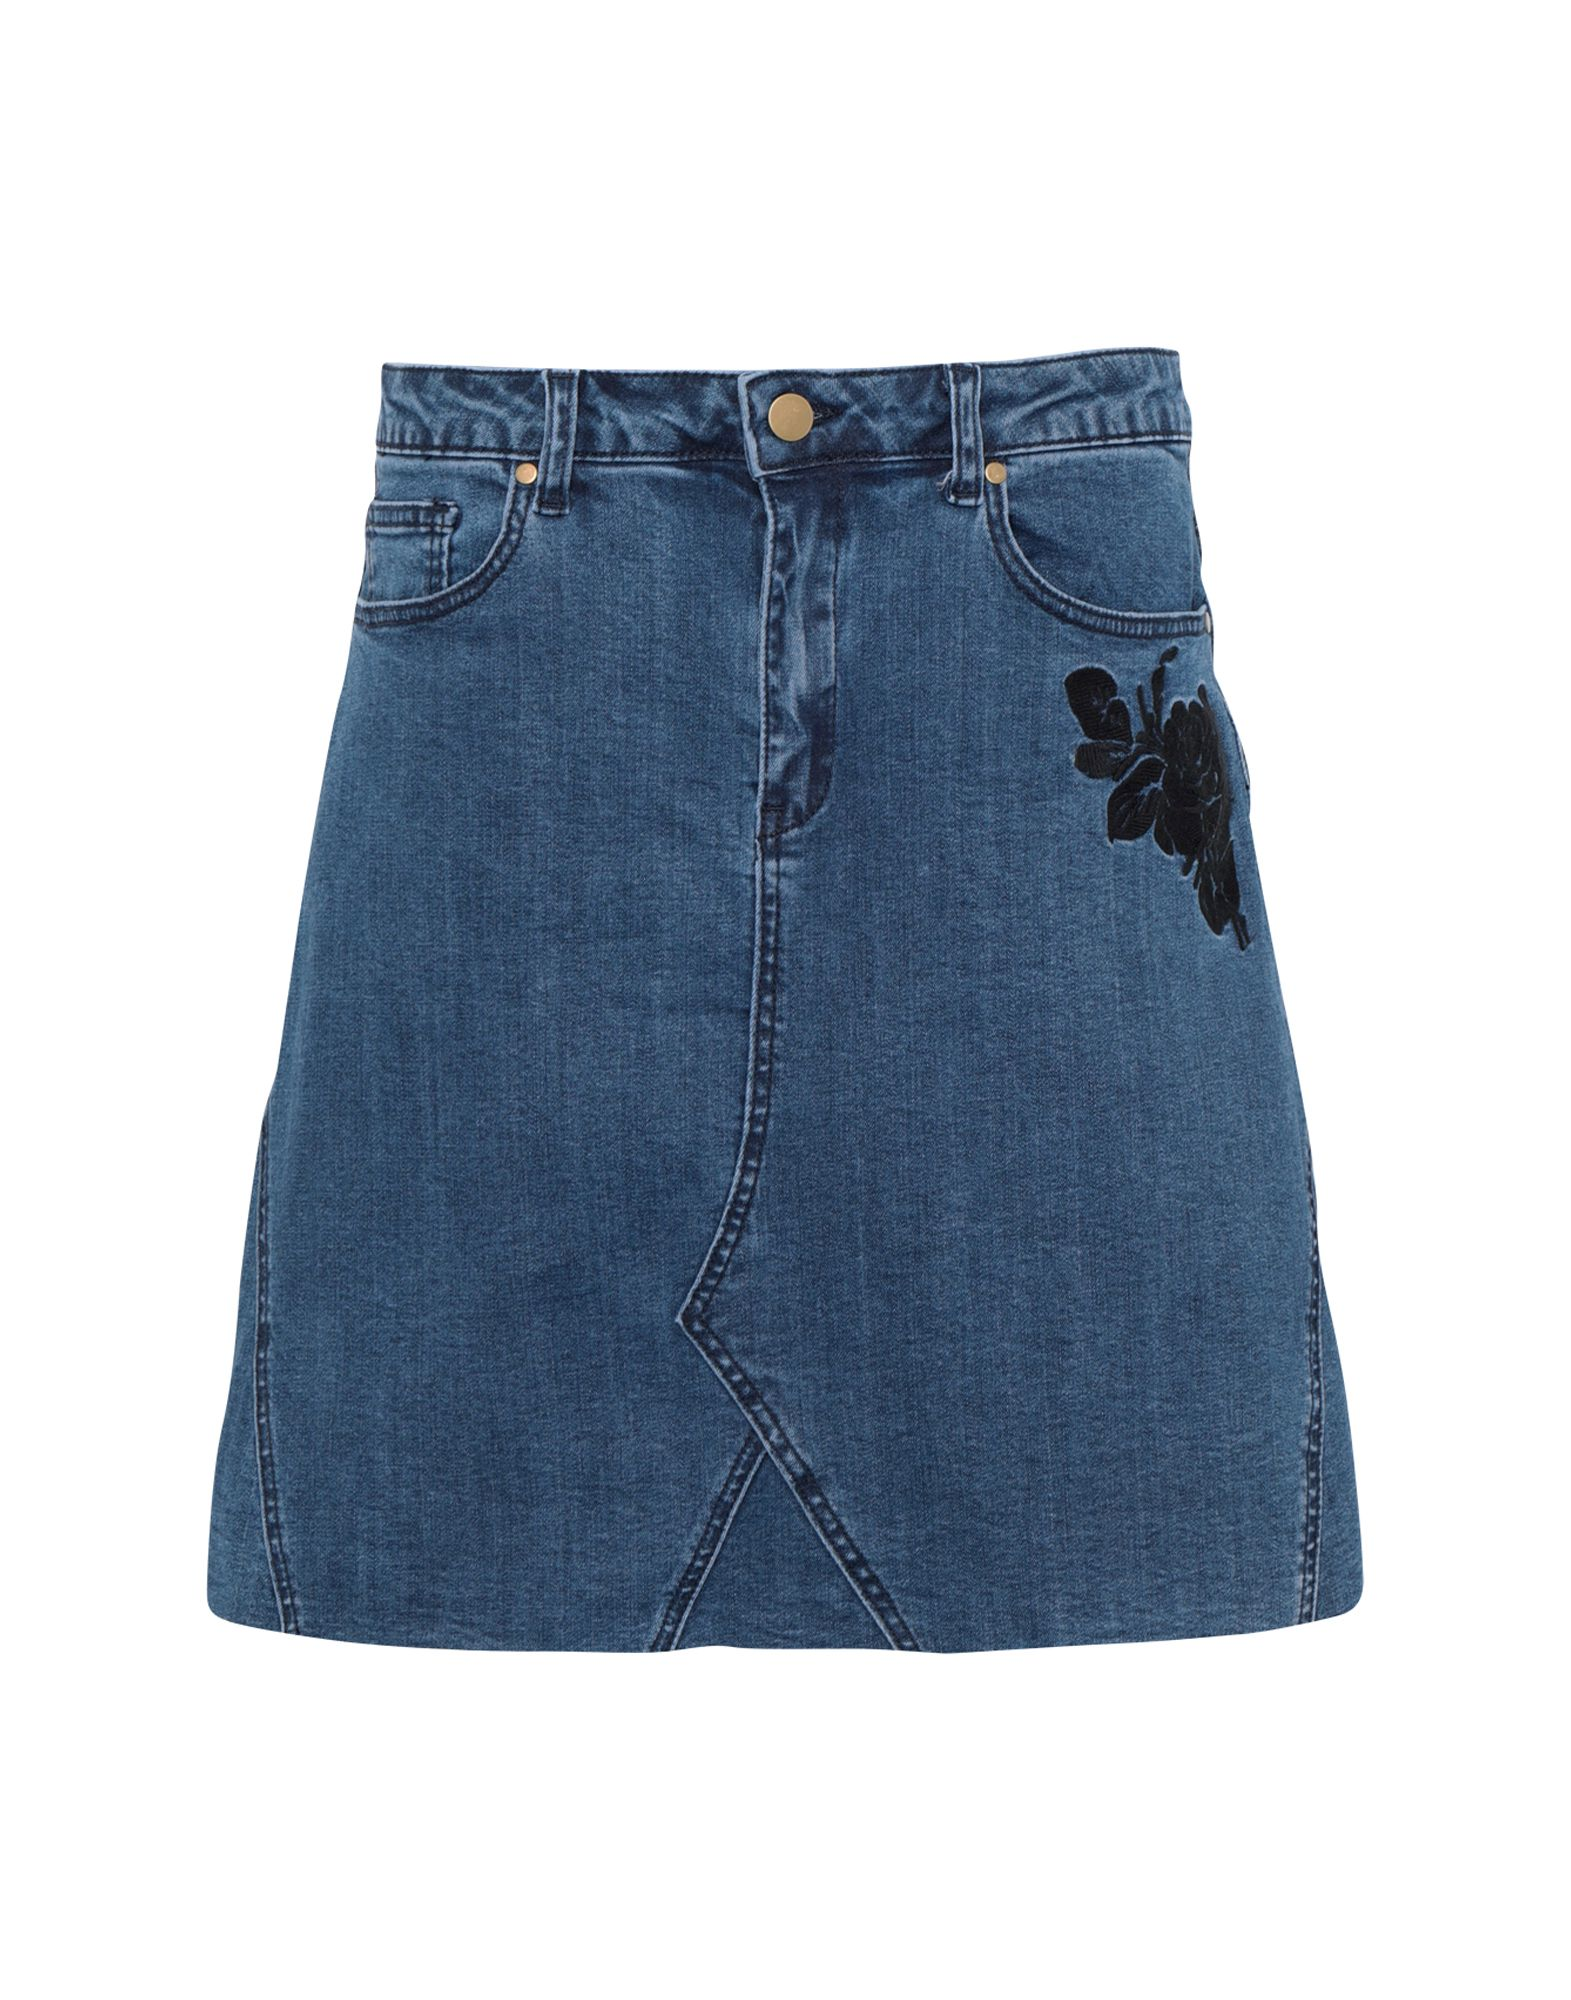 GEORGE J. LOVE Джинсовая юбка george j love мини юбка